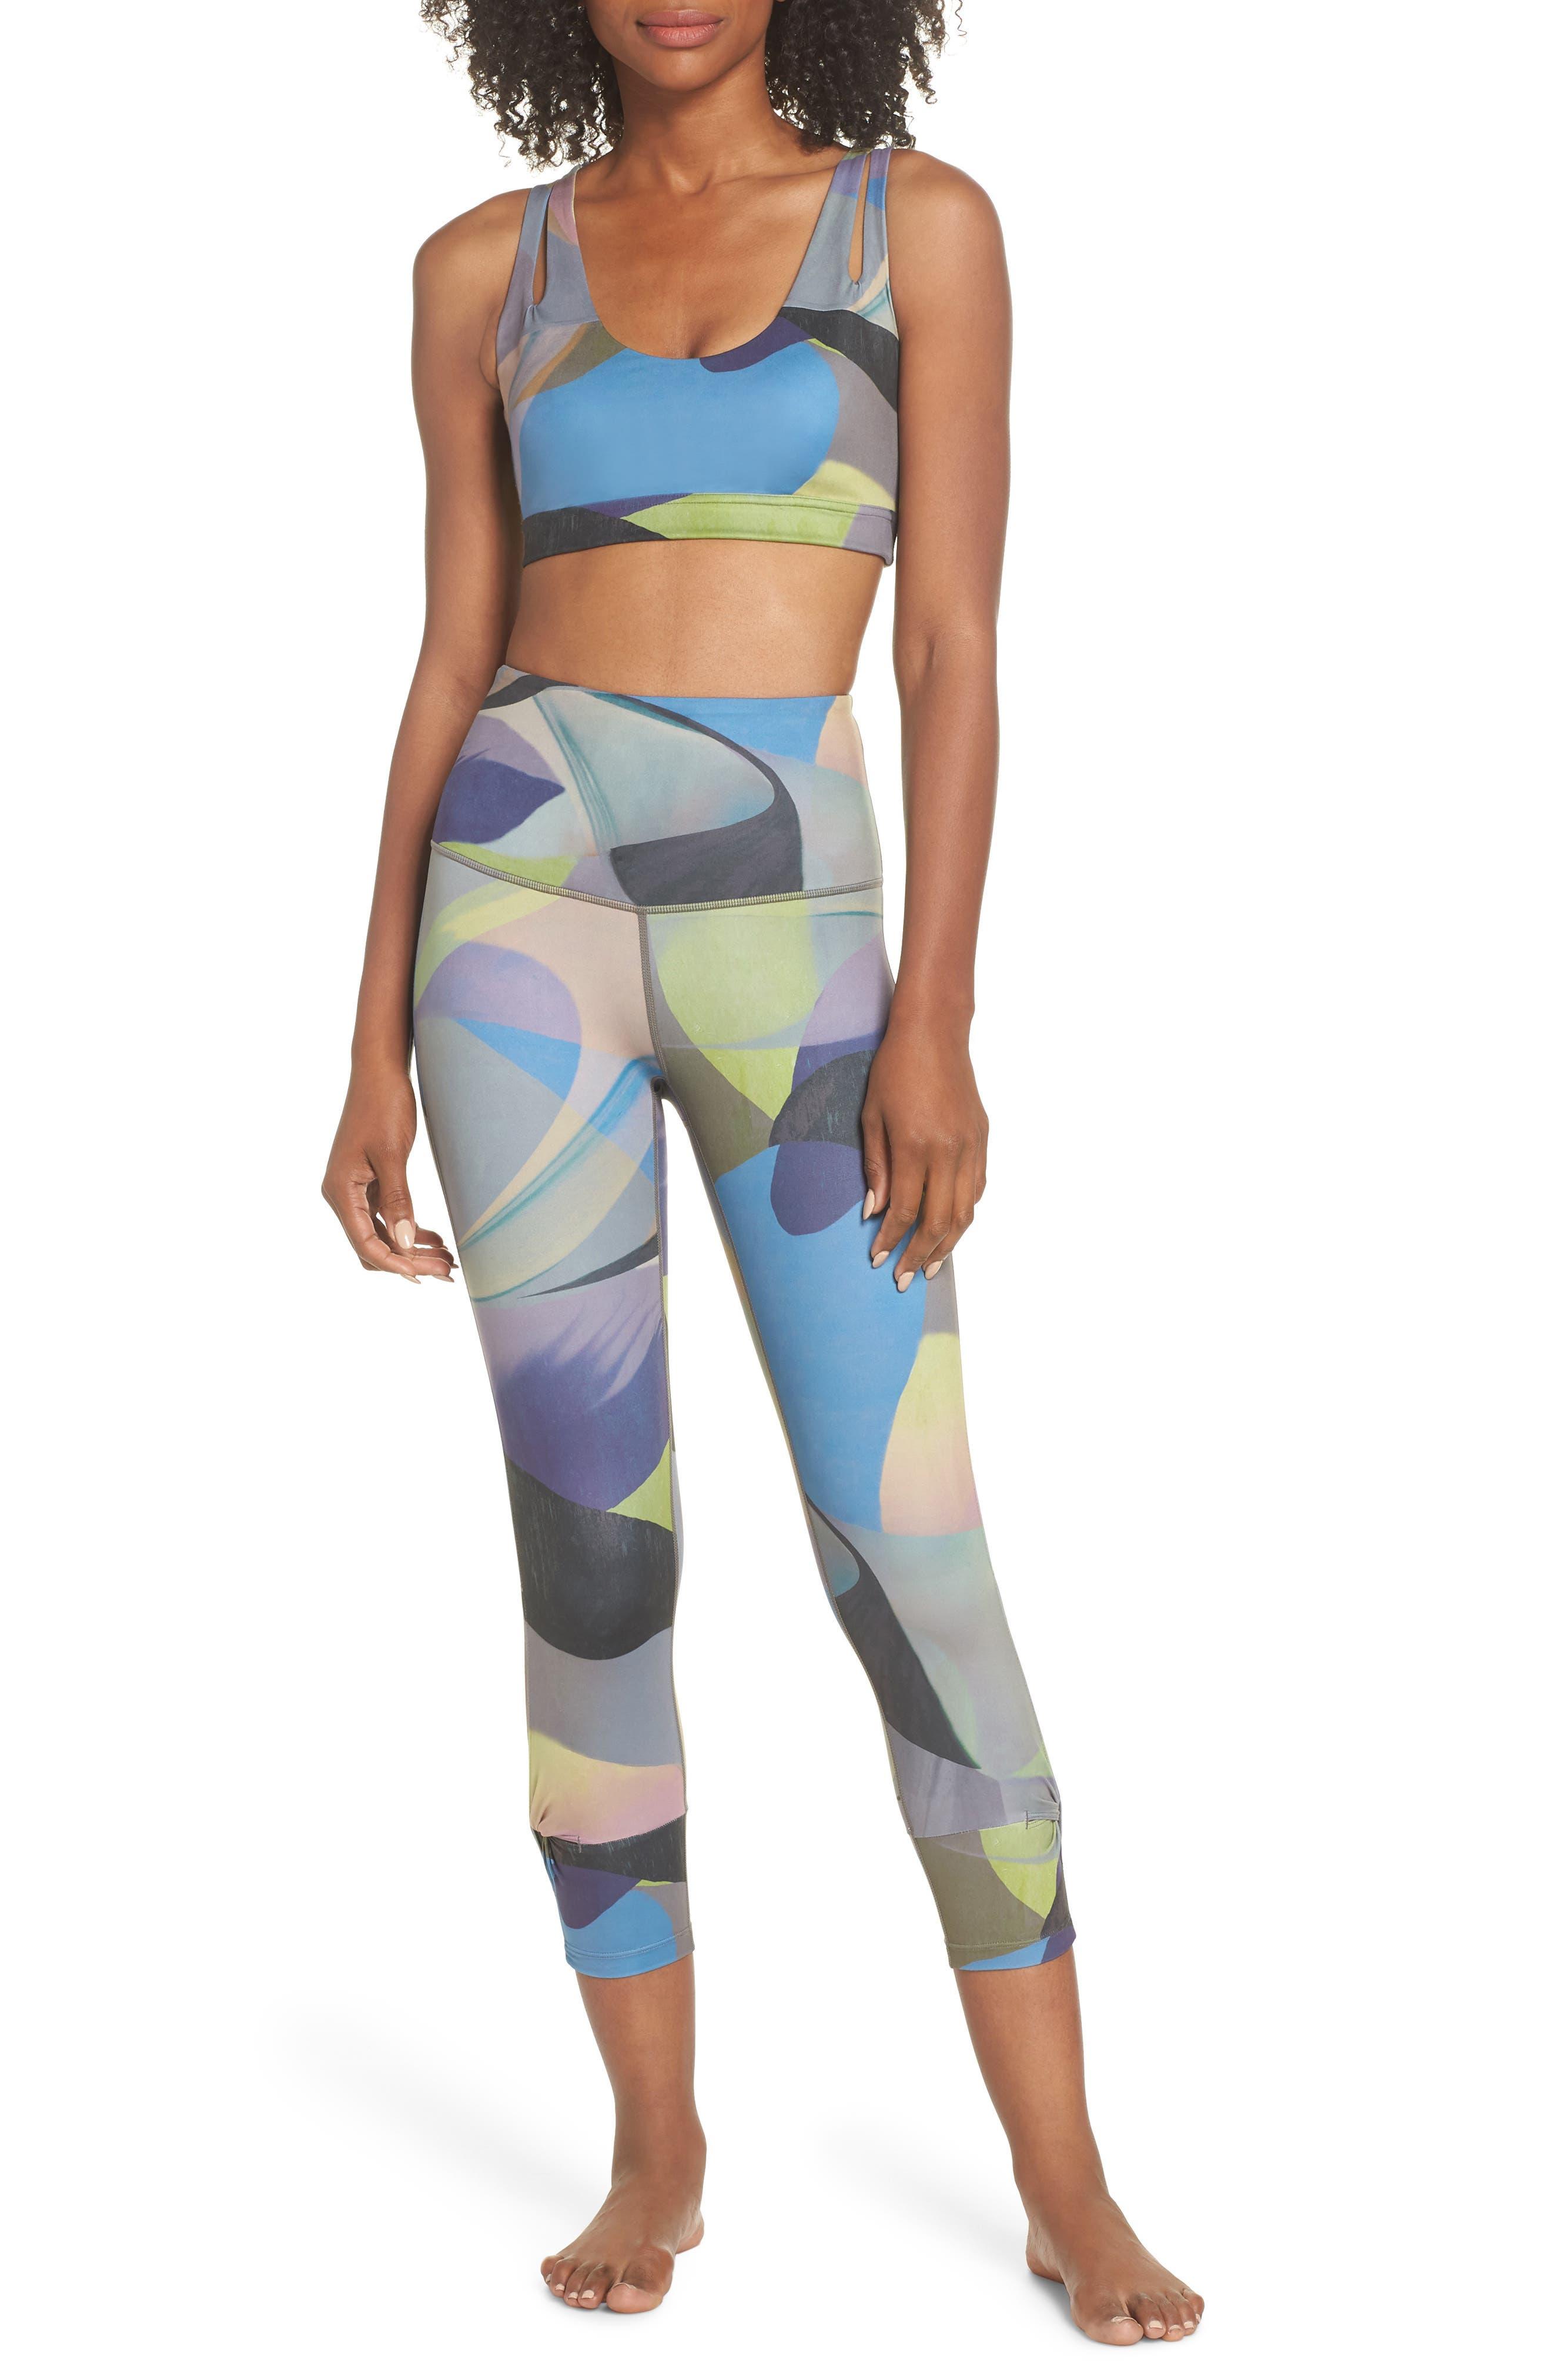 Katya High Waist Abstract Print Recycled Crop Leggings,                             Alternate thumbnail 8, color,                             GREY URBAN ABSTRACT BOTANICAL